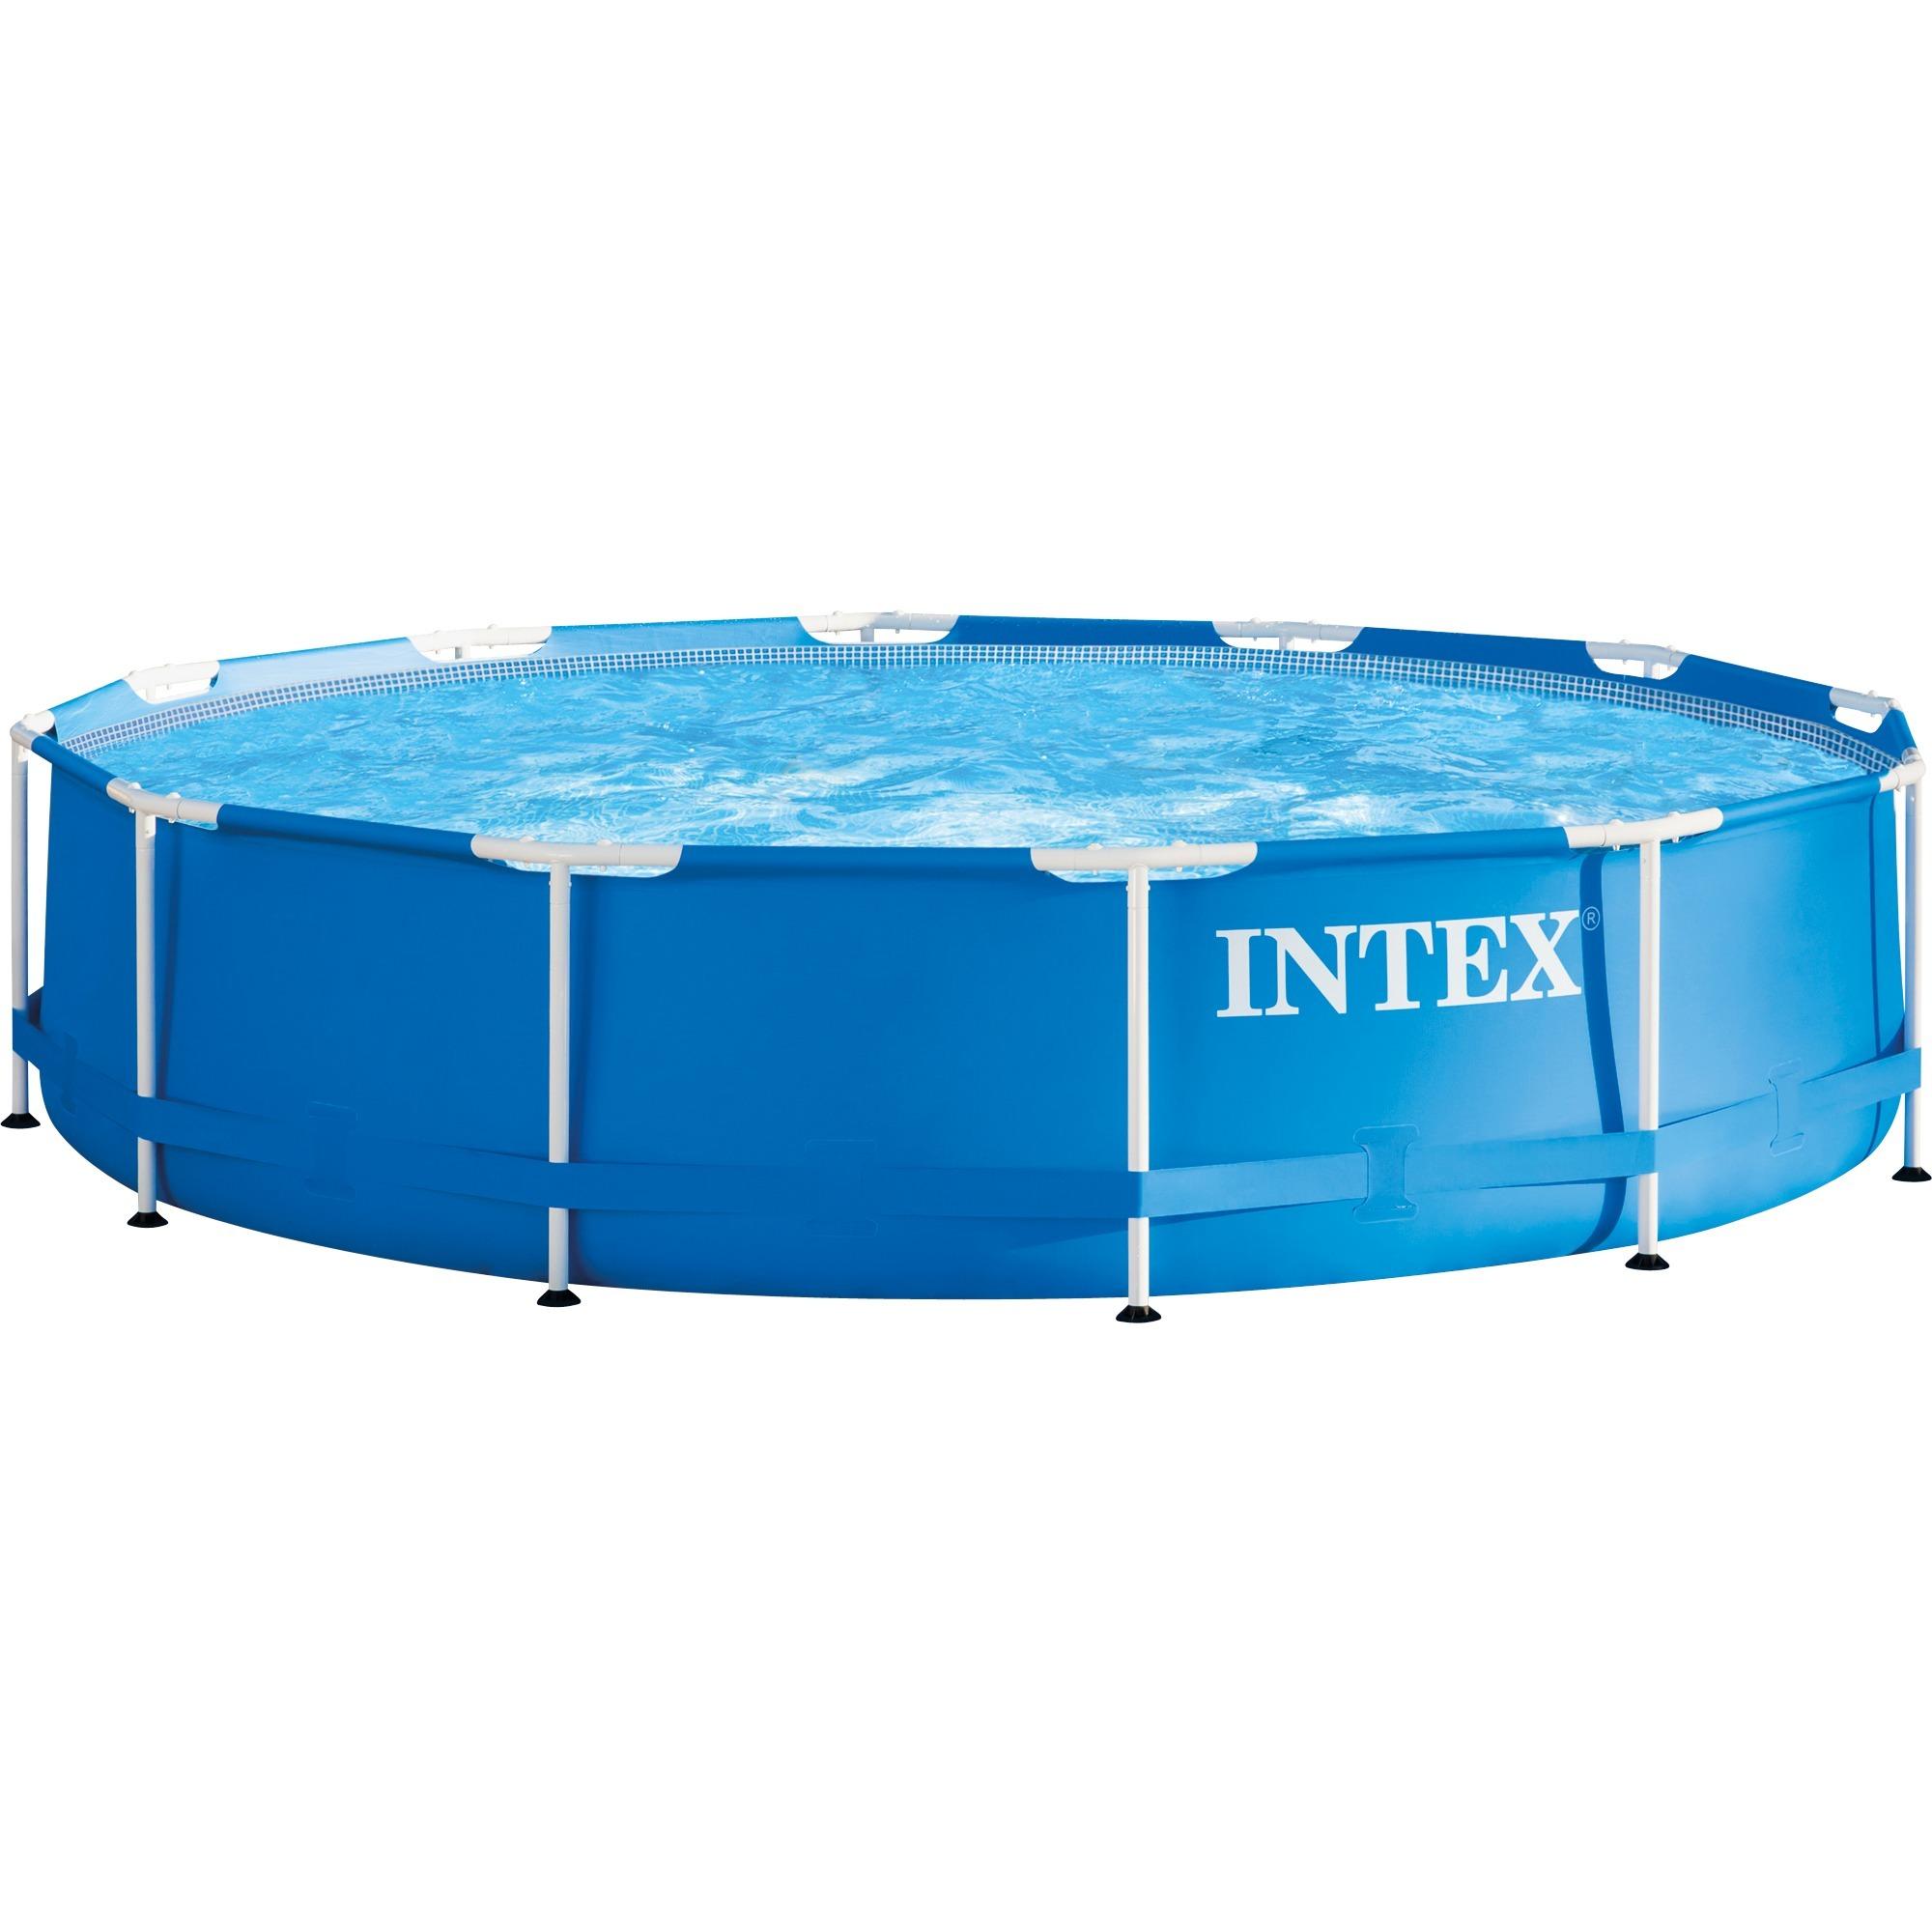 128202gn-swimming-pool